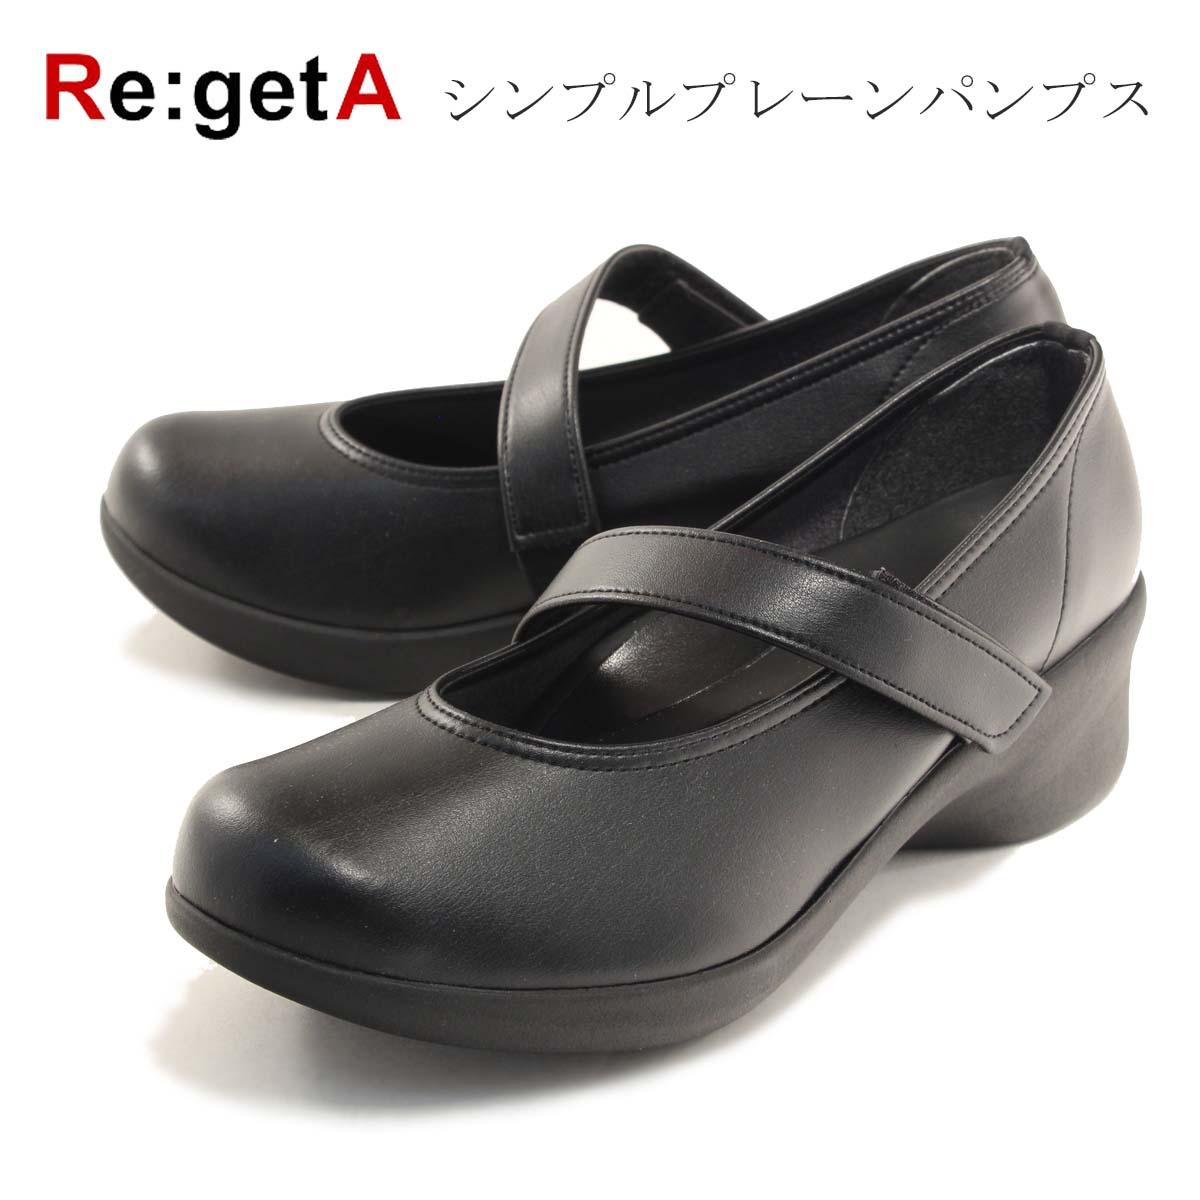 【Re:getA リゲッタ】【コンフォートパンプス】 ワークパンプス シンプルプレーンパンプス R-0011【送料無料】【日本製/国産/Made In Japan】